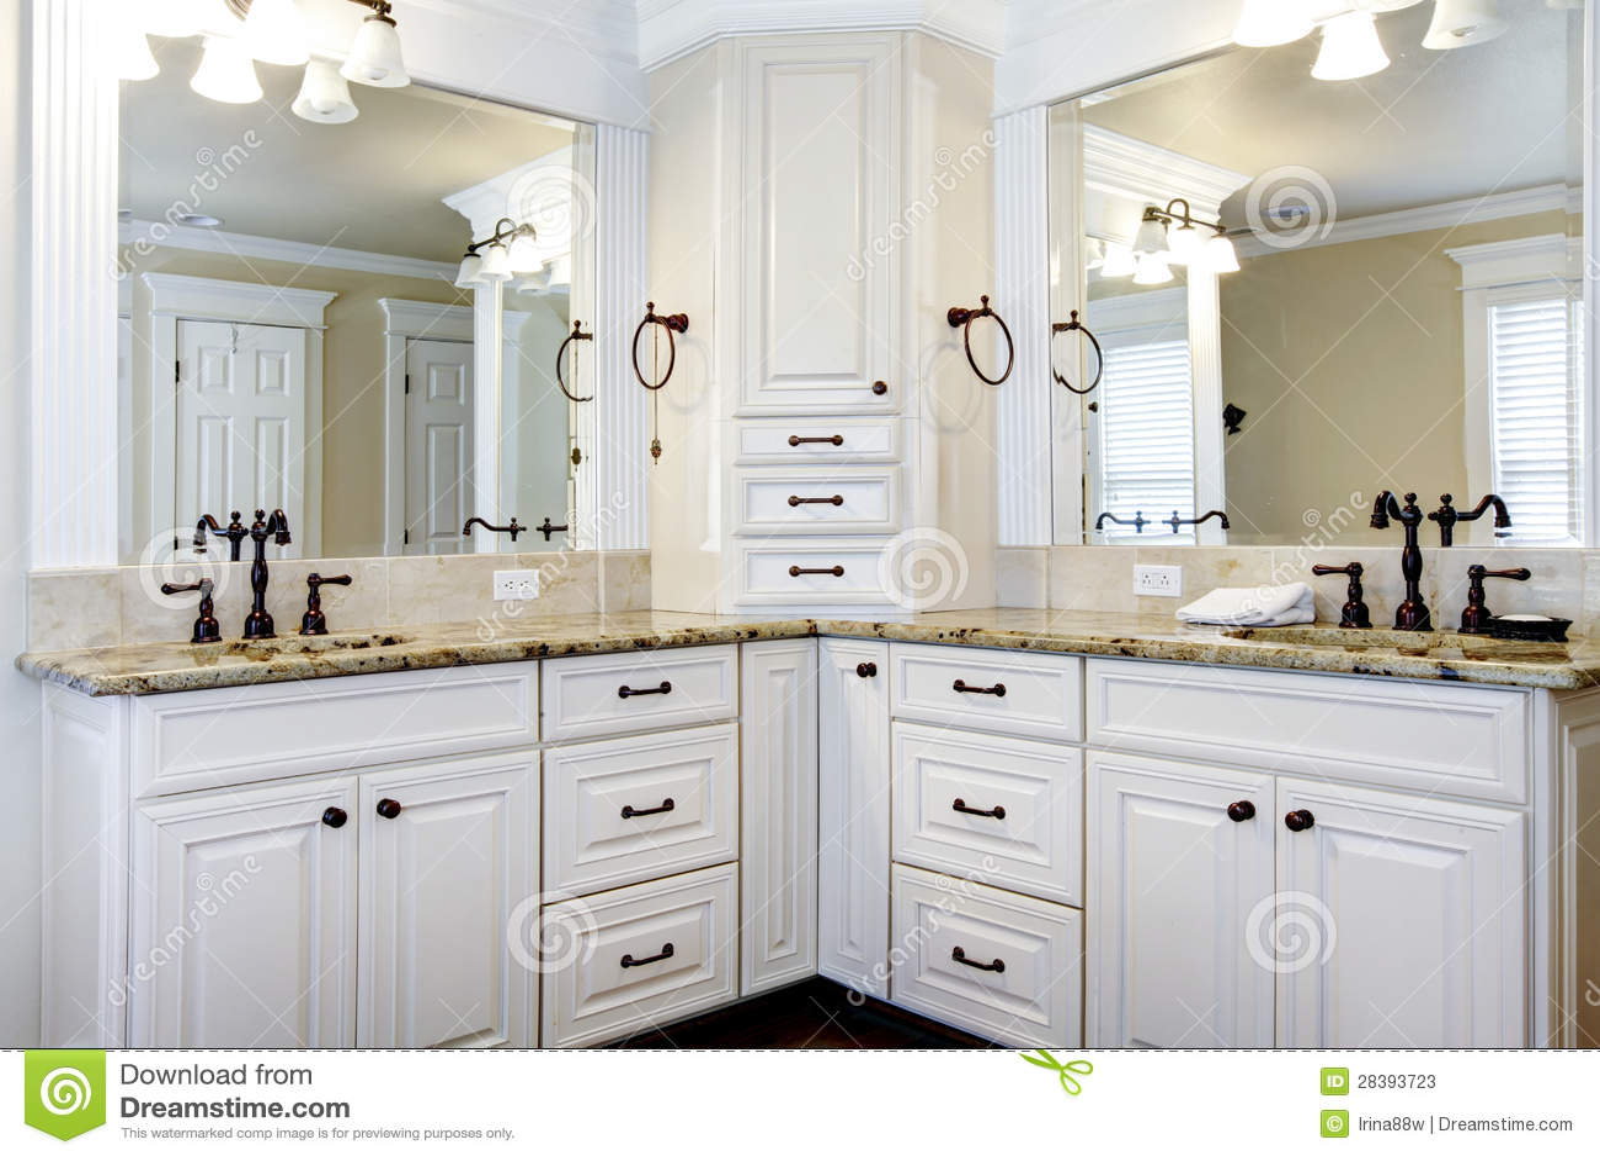 Fotos de Stock: Grandes gabinetes de banheiro mestres brancos luxuosos  #5F4B37 1300 957